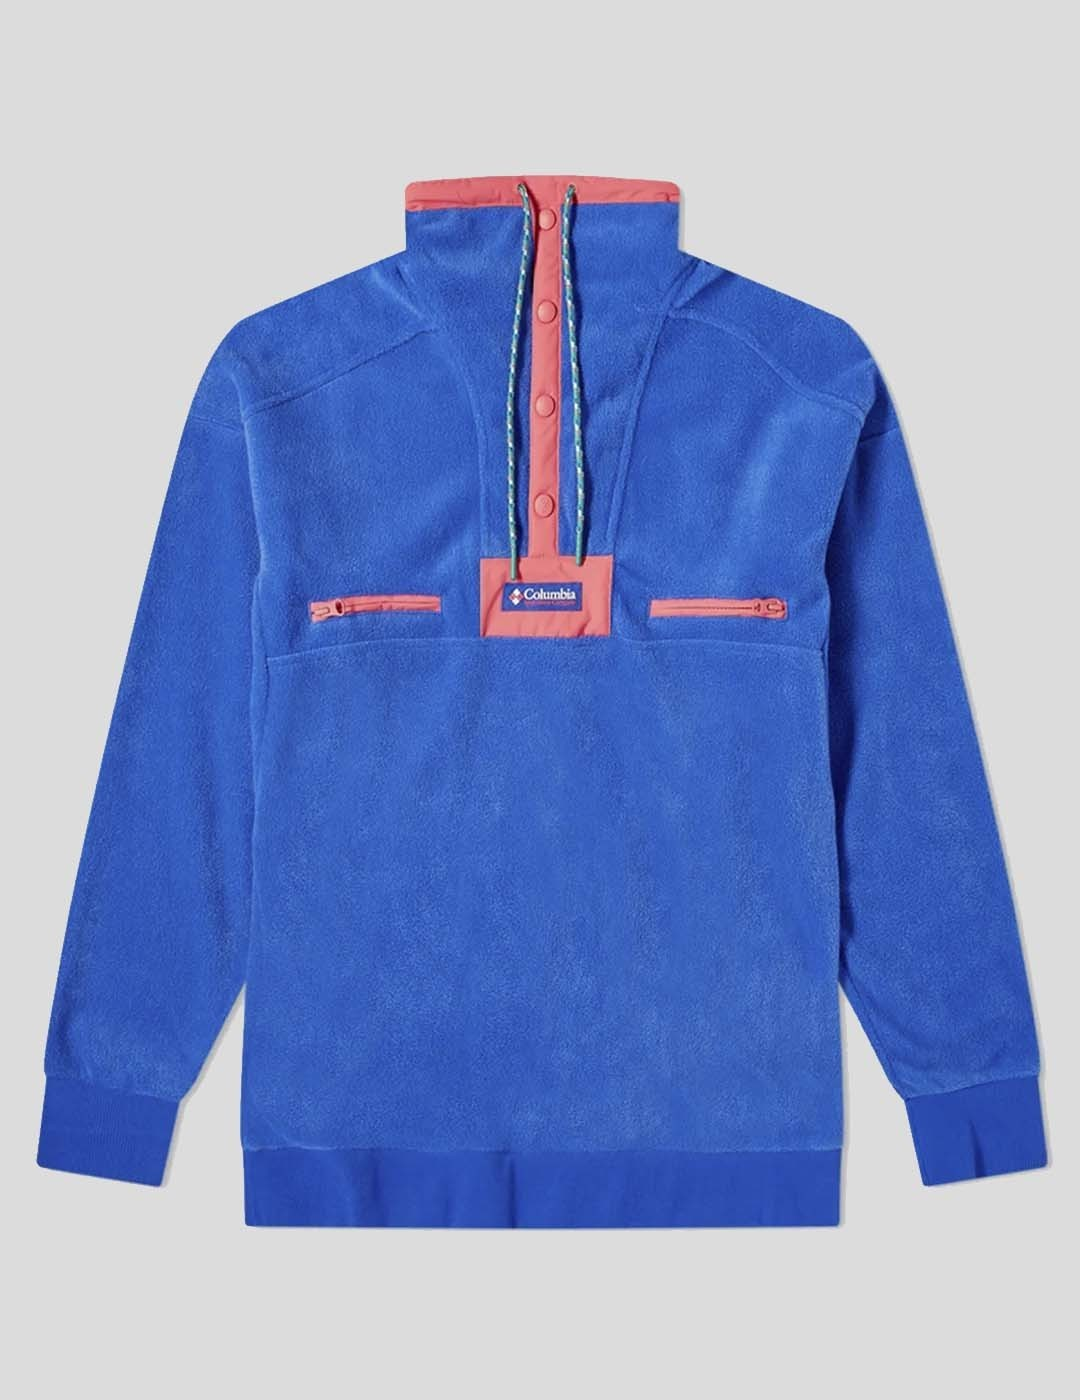 CHAQUETA COLUMBIA POWDER KEG FLEECE LAPIS BLUE